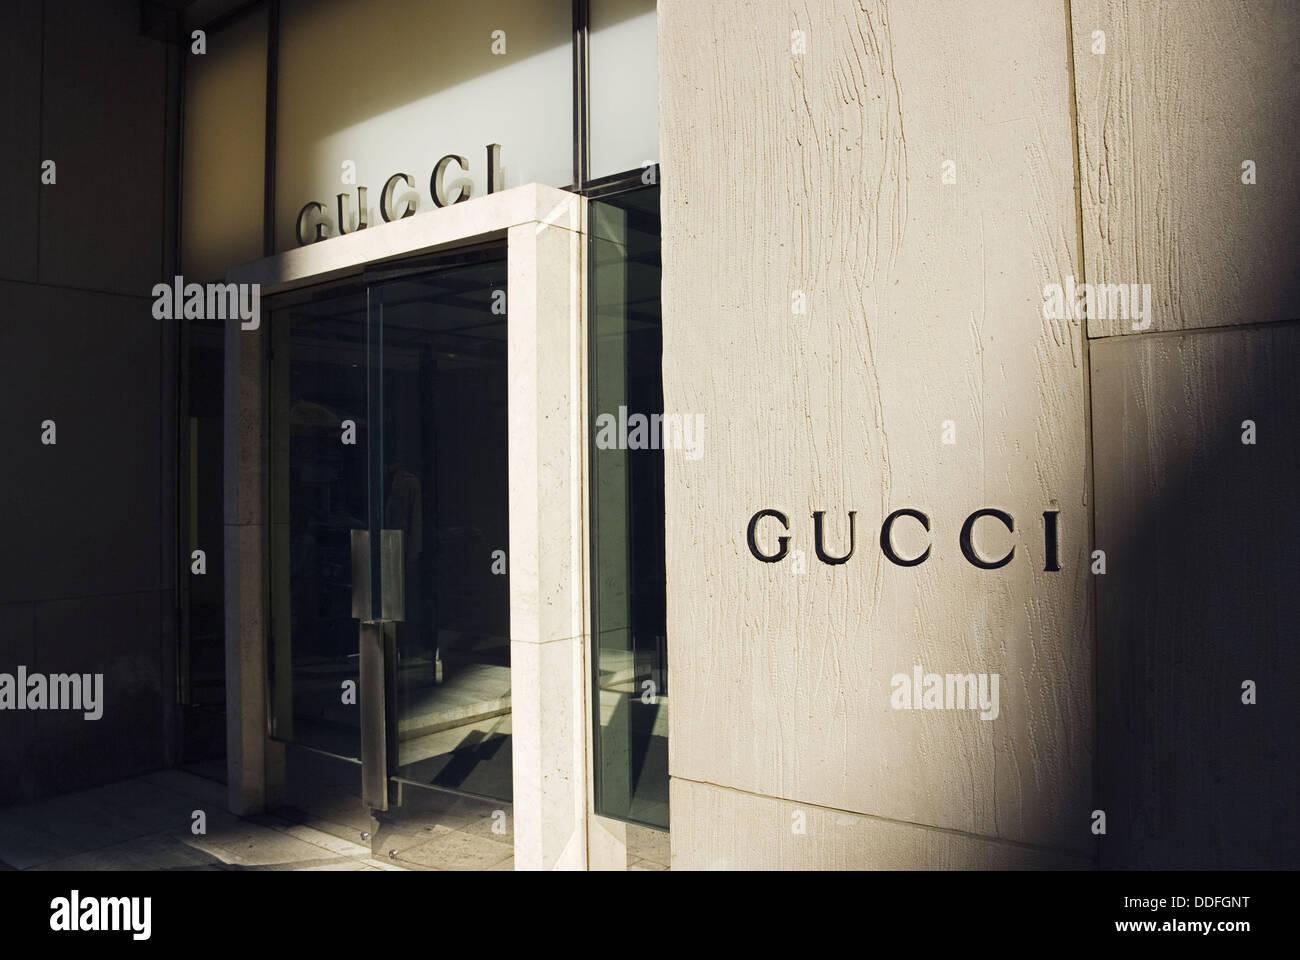 gucci 5th ave. gucci storefront, 5th avenue, manhattan, new york city, york, usa ave i